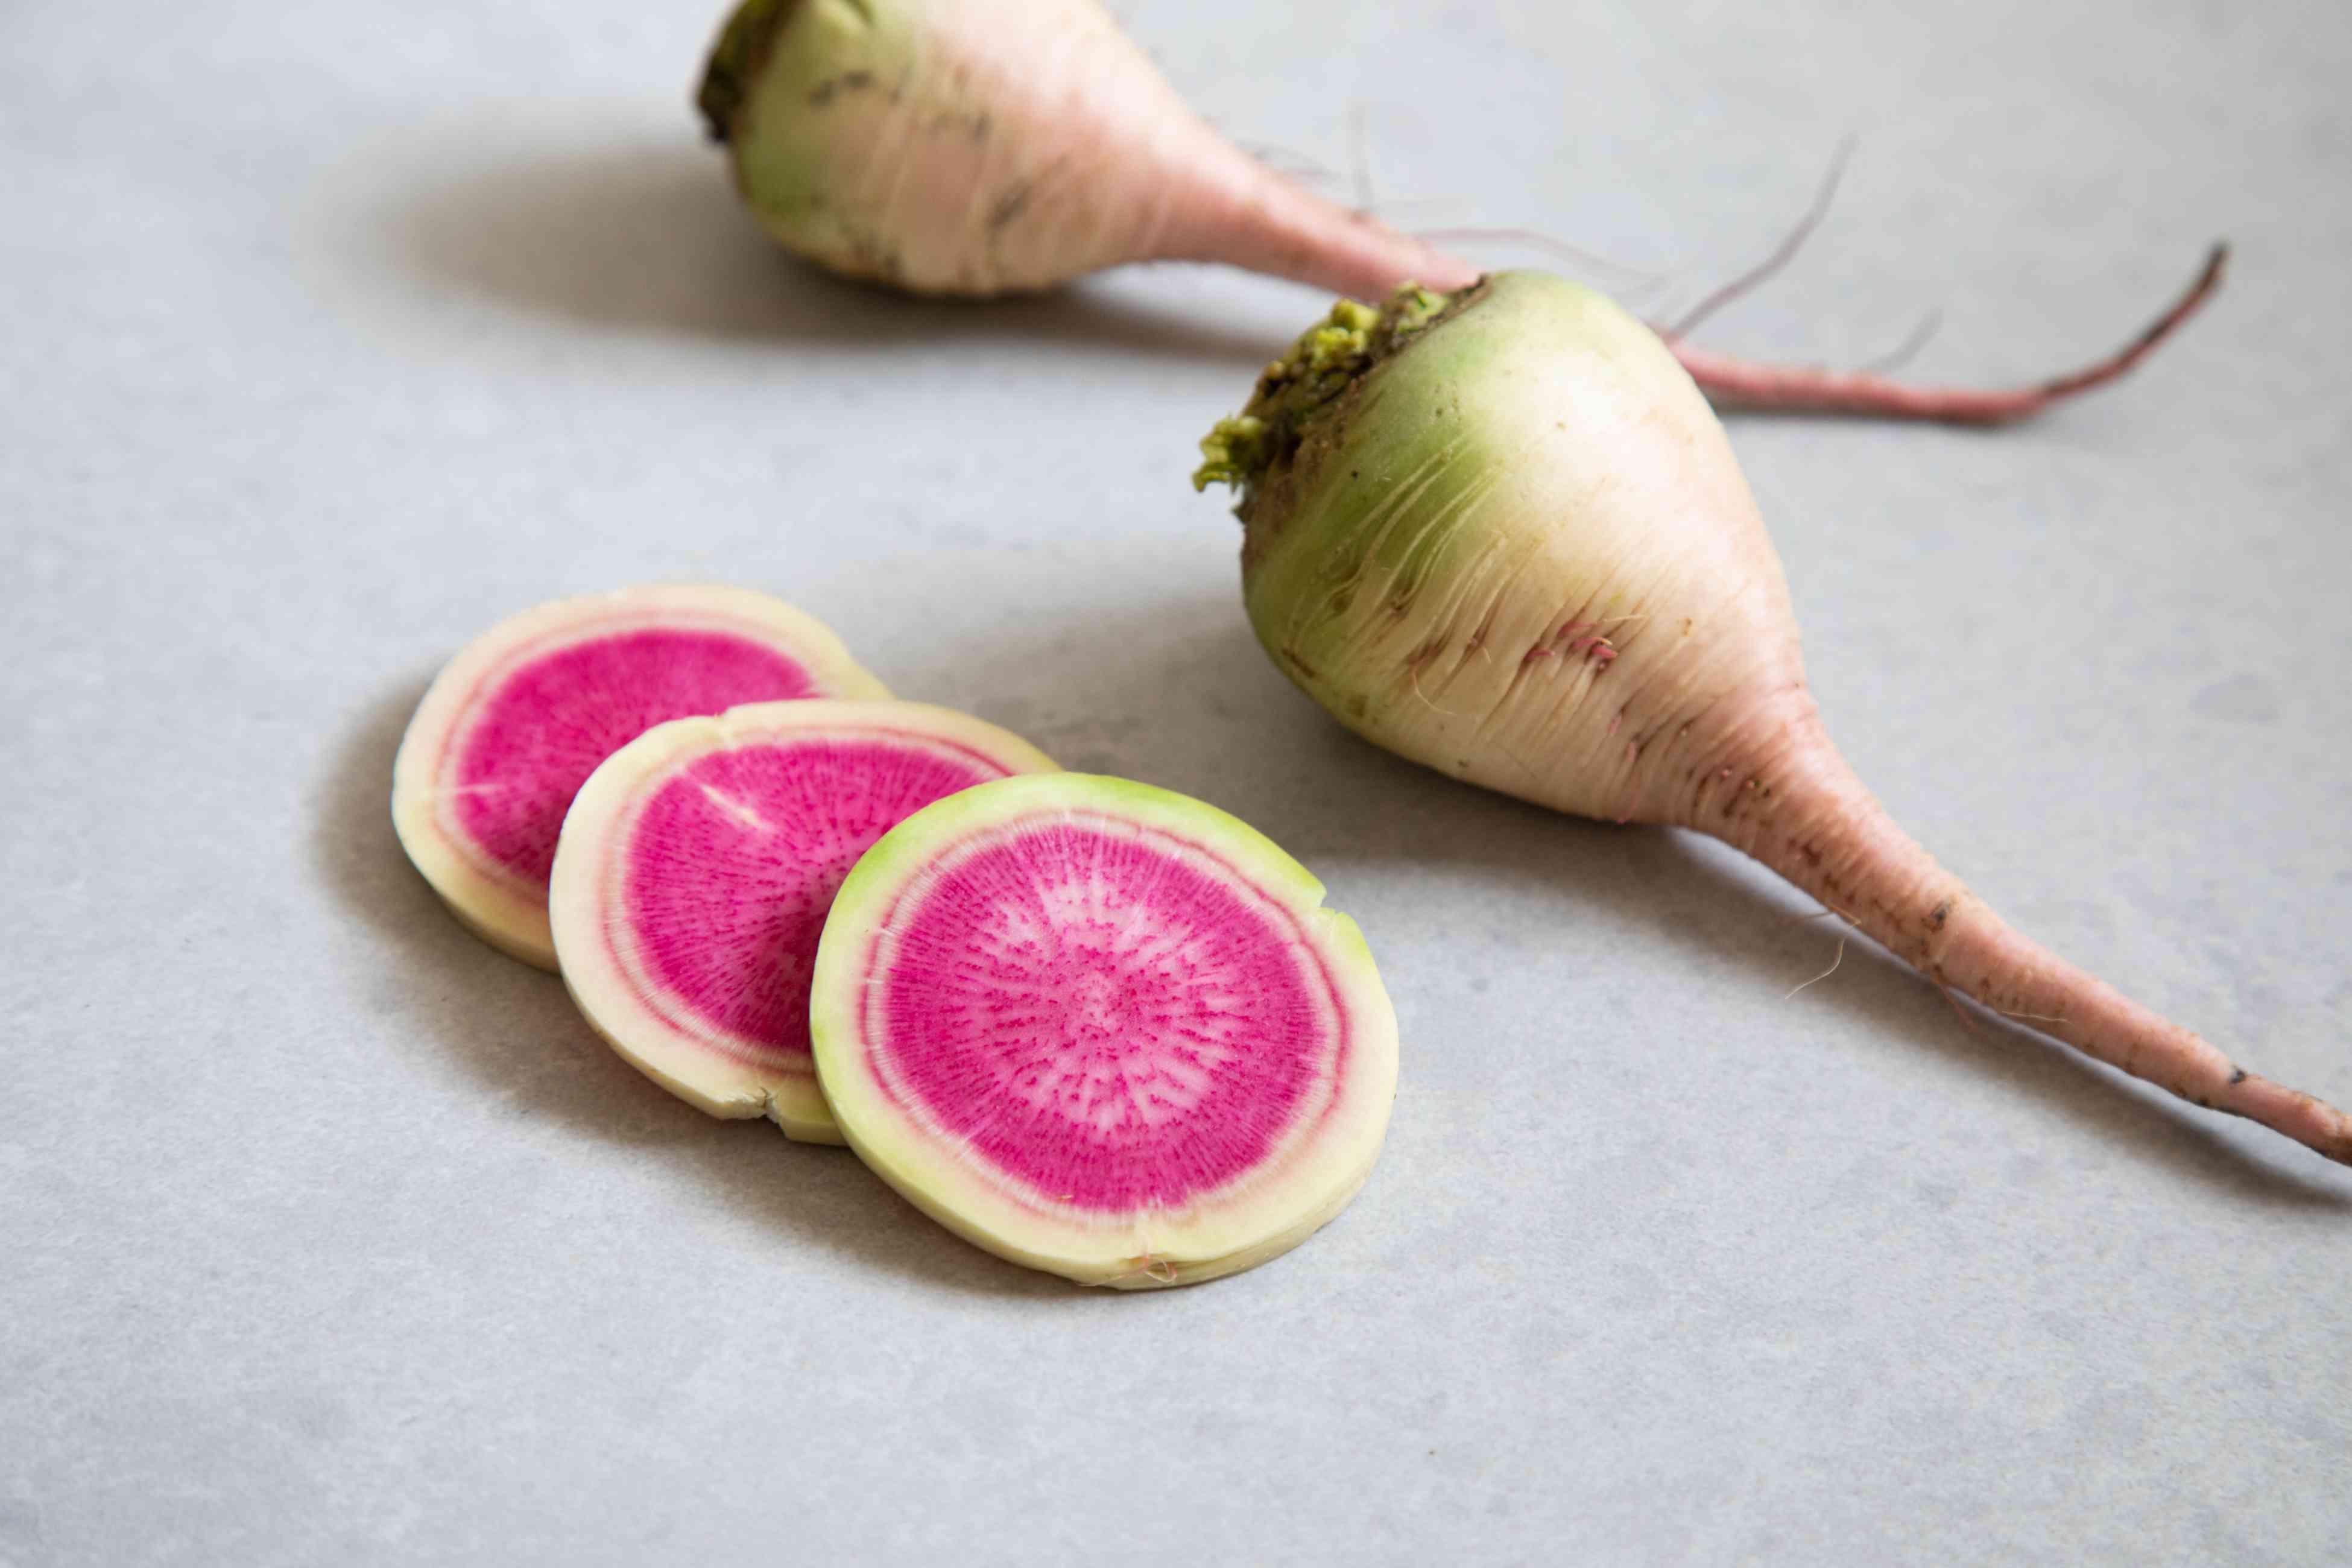 Sliced and whole watermelon radish